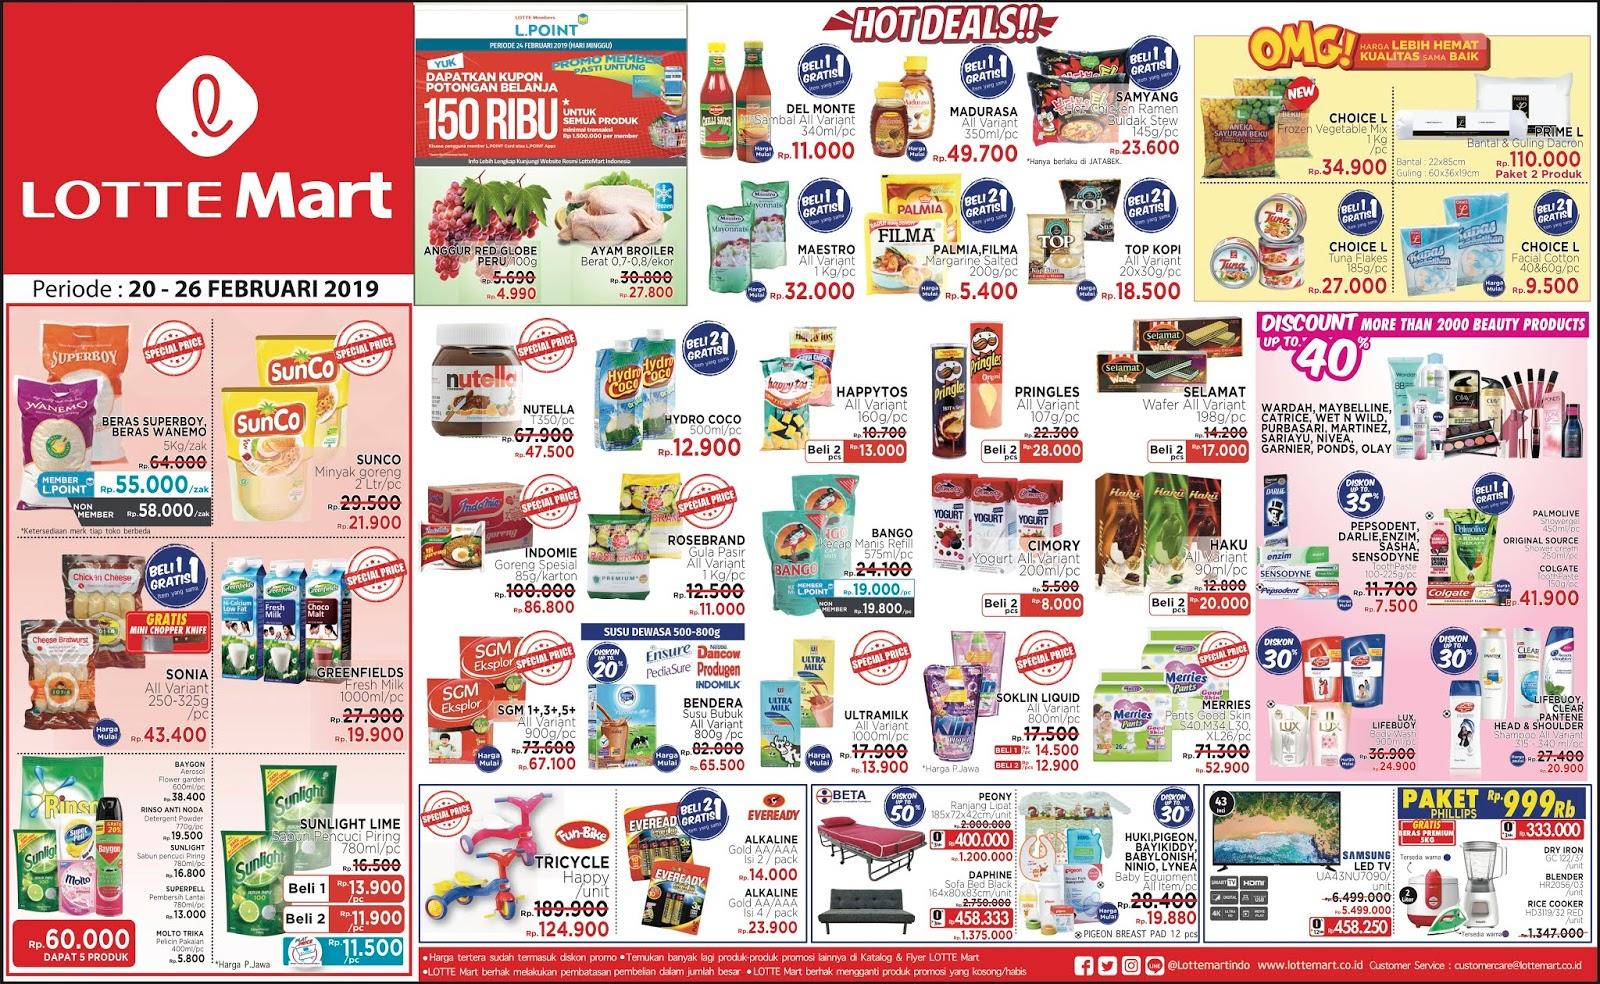 #Lottemart - #Promo #Katalog Periode 20 - 26 Februari 2019